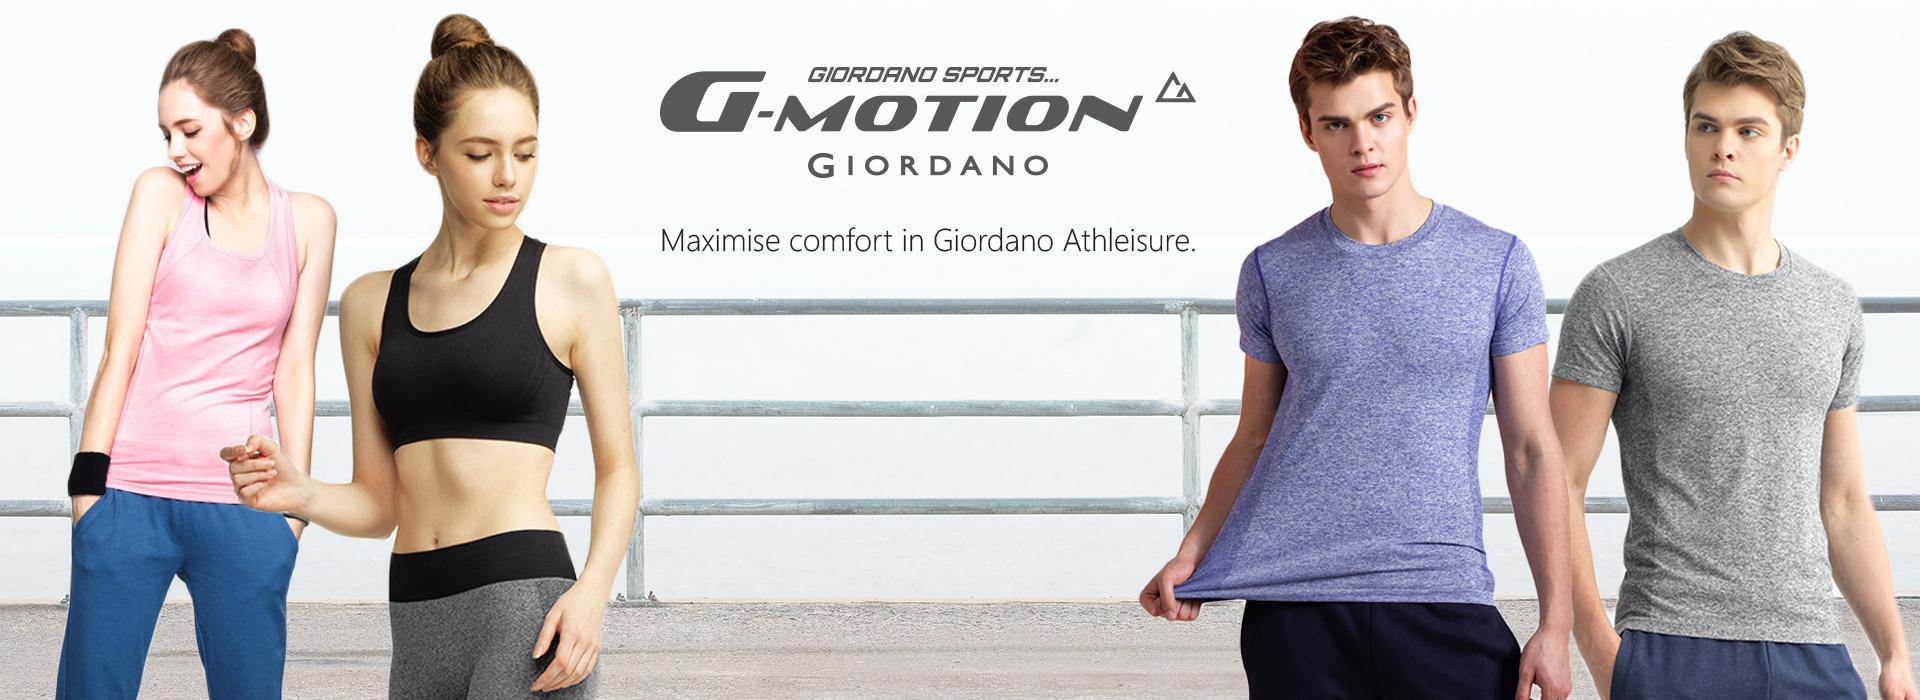 G Motion sport series